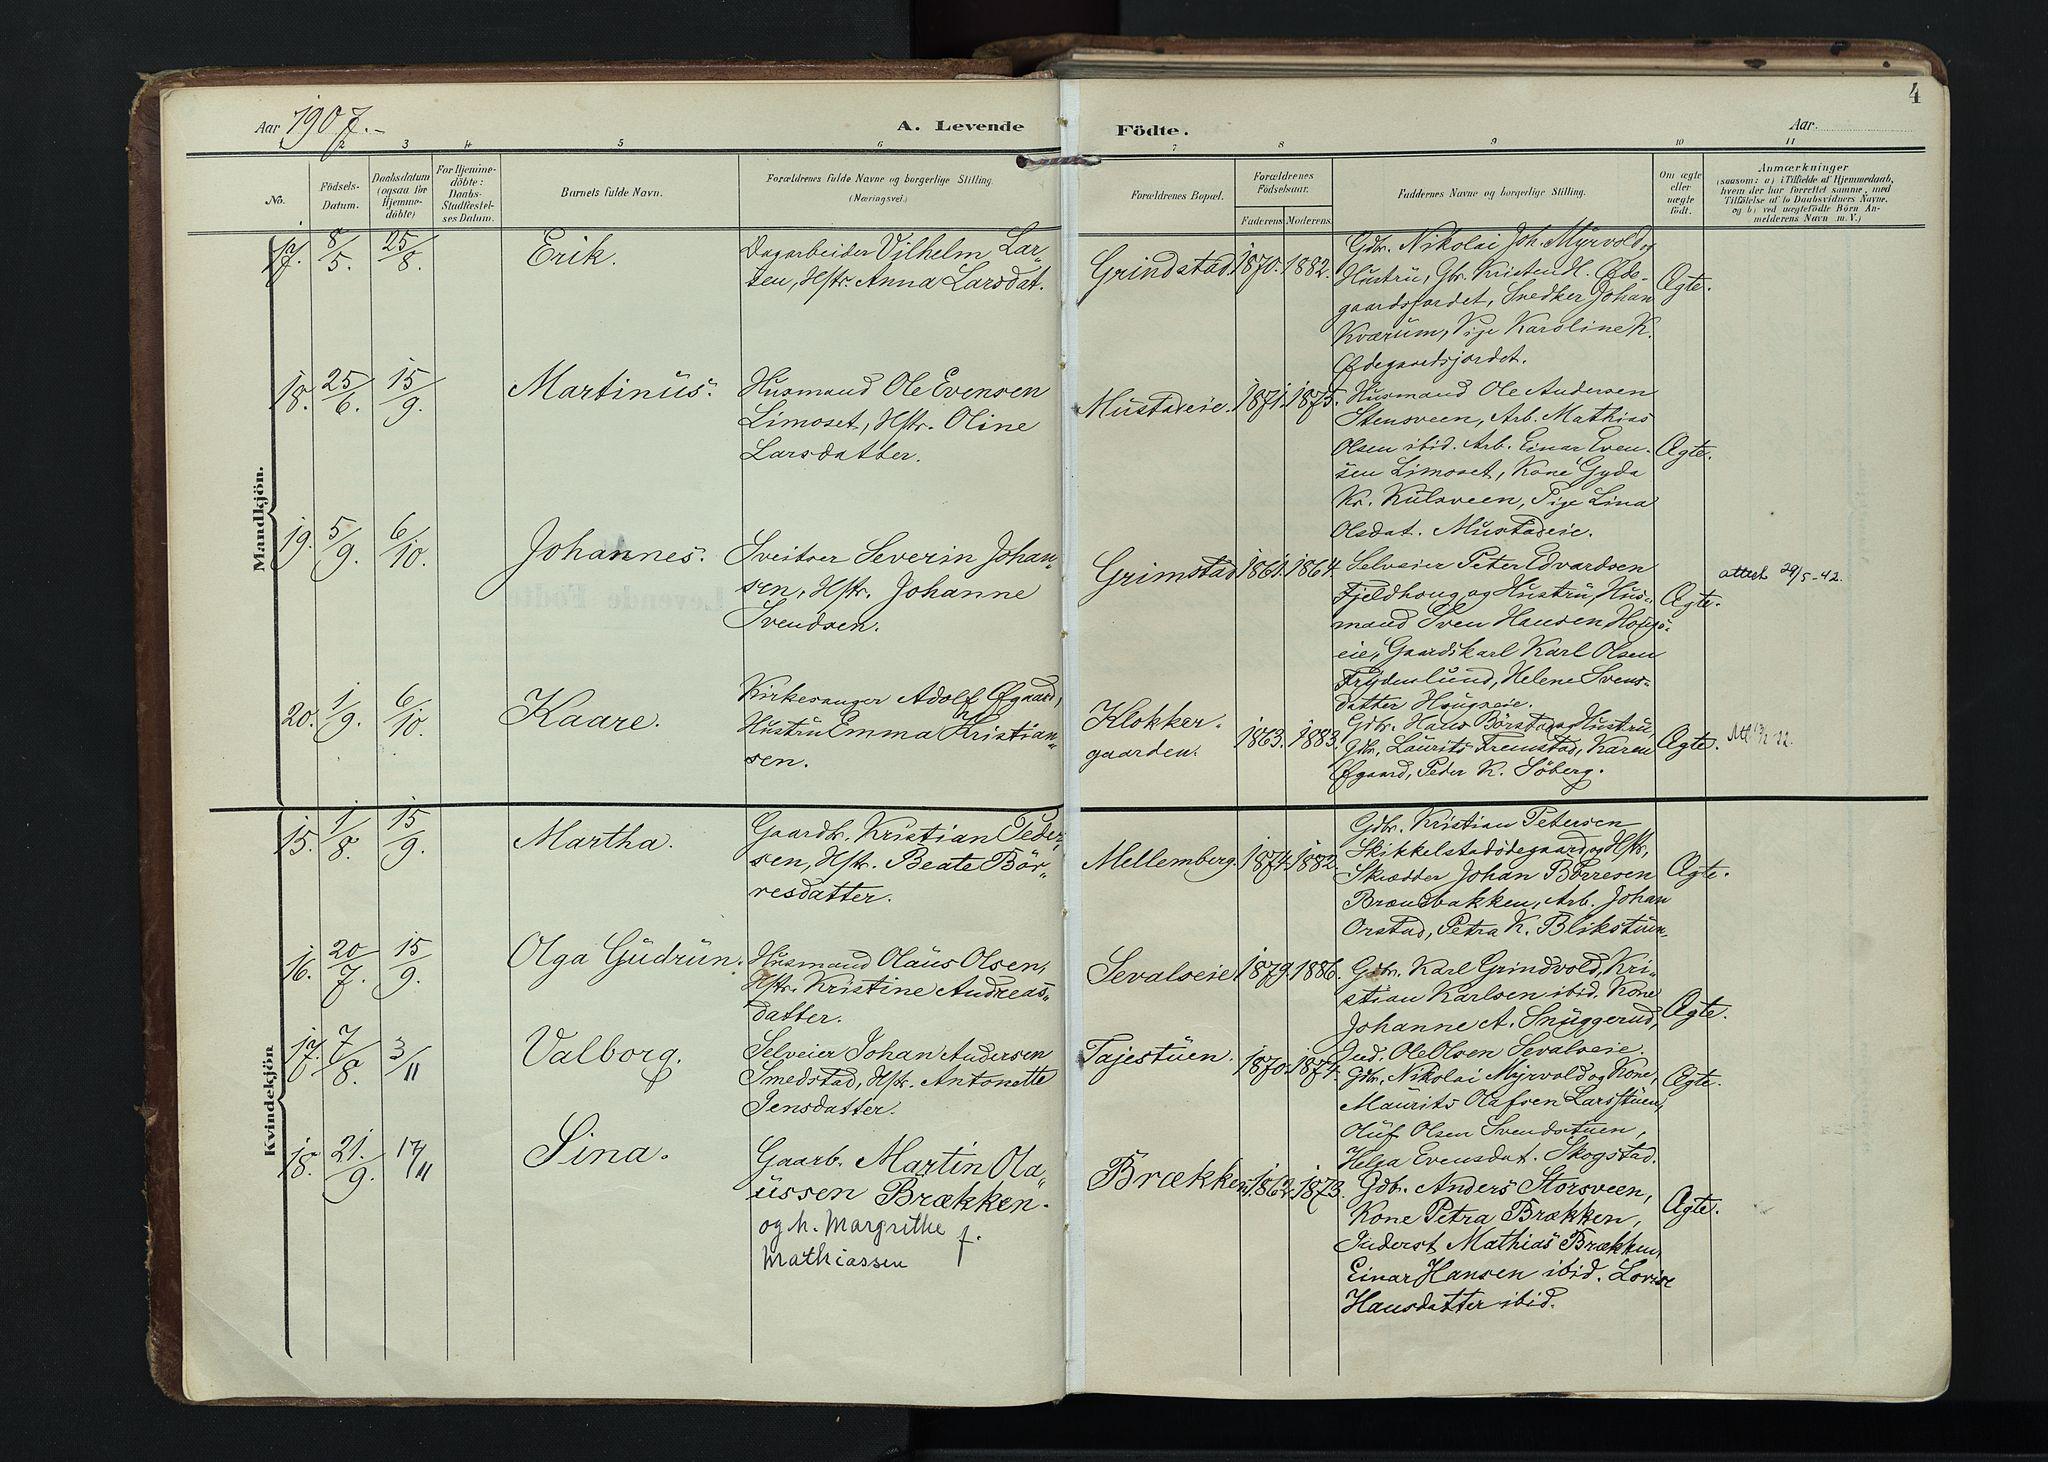 SAH, Vardal prestekontor, H/Ha/Haa/L0020: Ministerialbok nr. 20, 1907-1921, s. 4